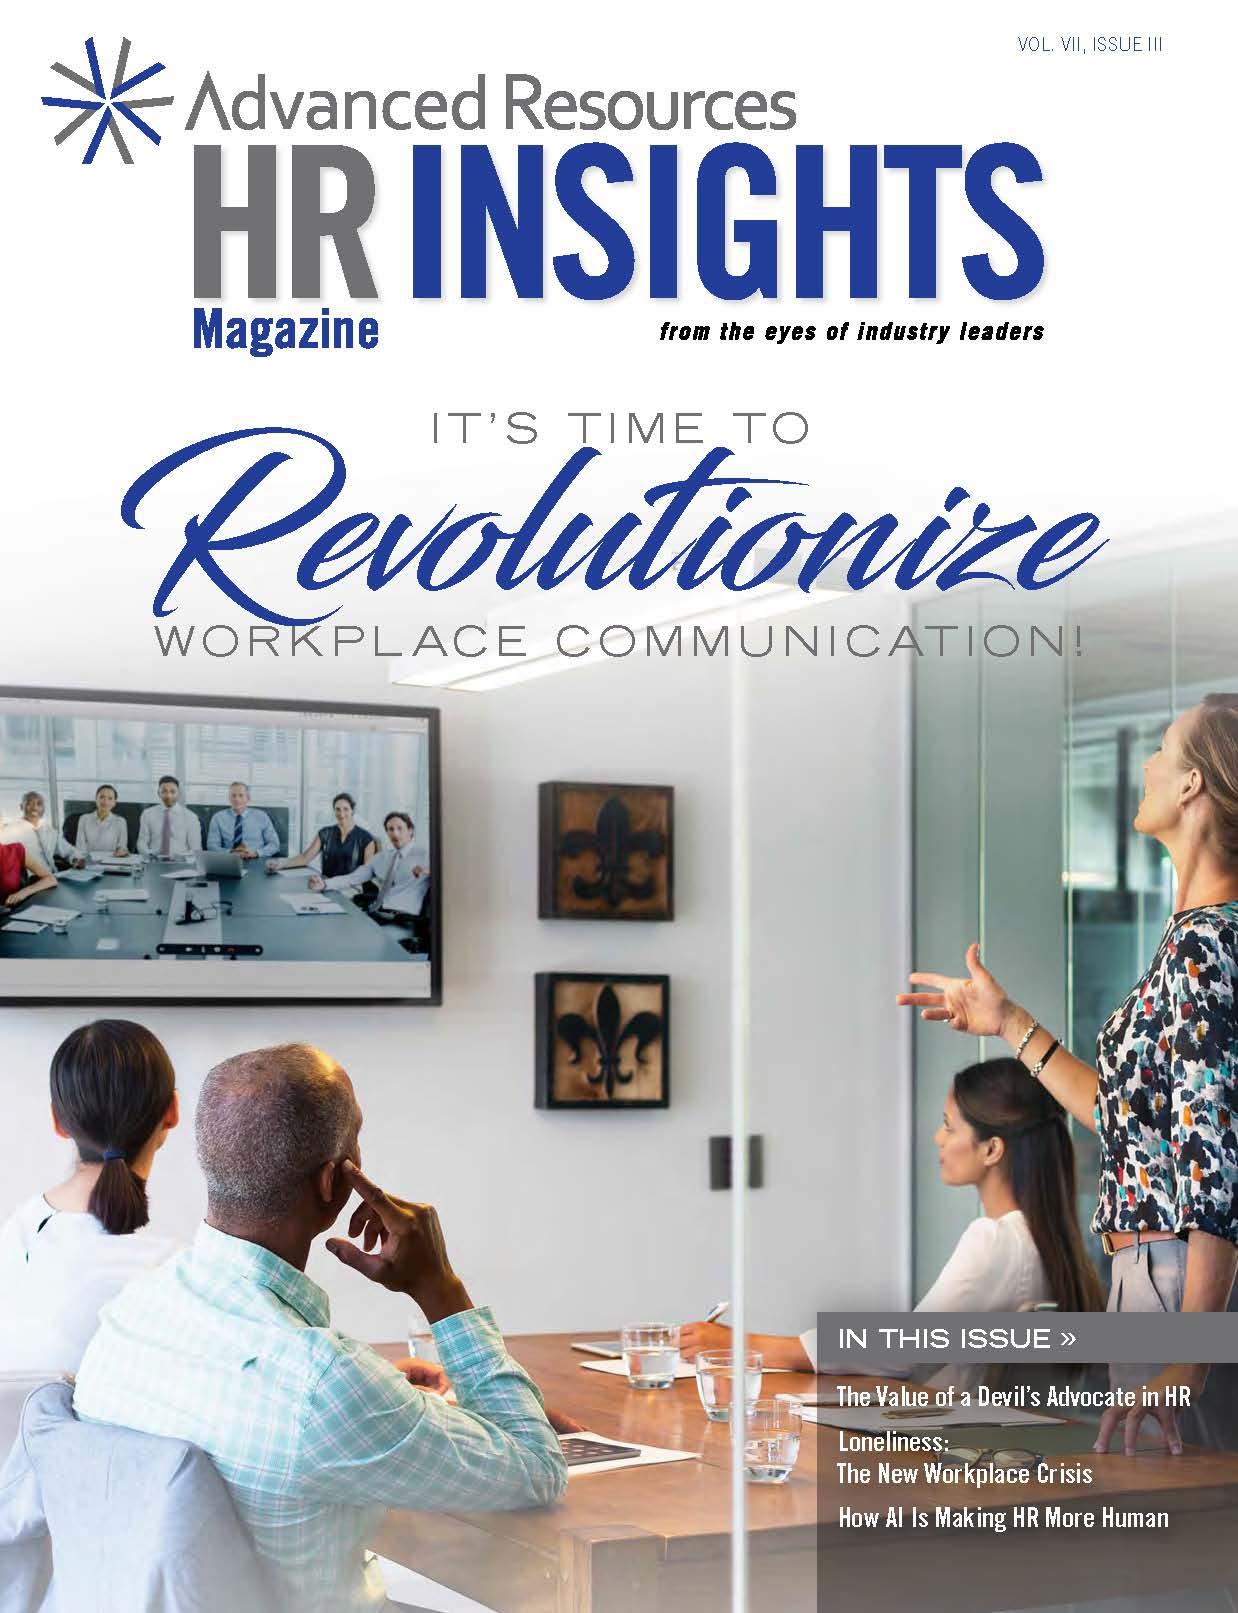 AdvancedResources_HRInsights_Vol.VII-Issue-III_Page_01.jpg